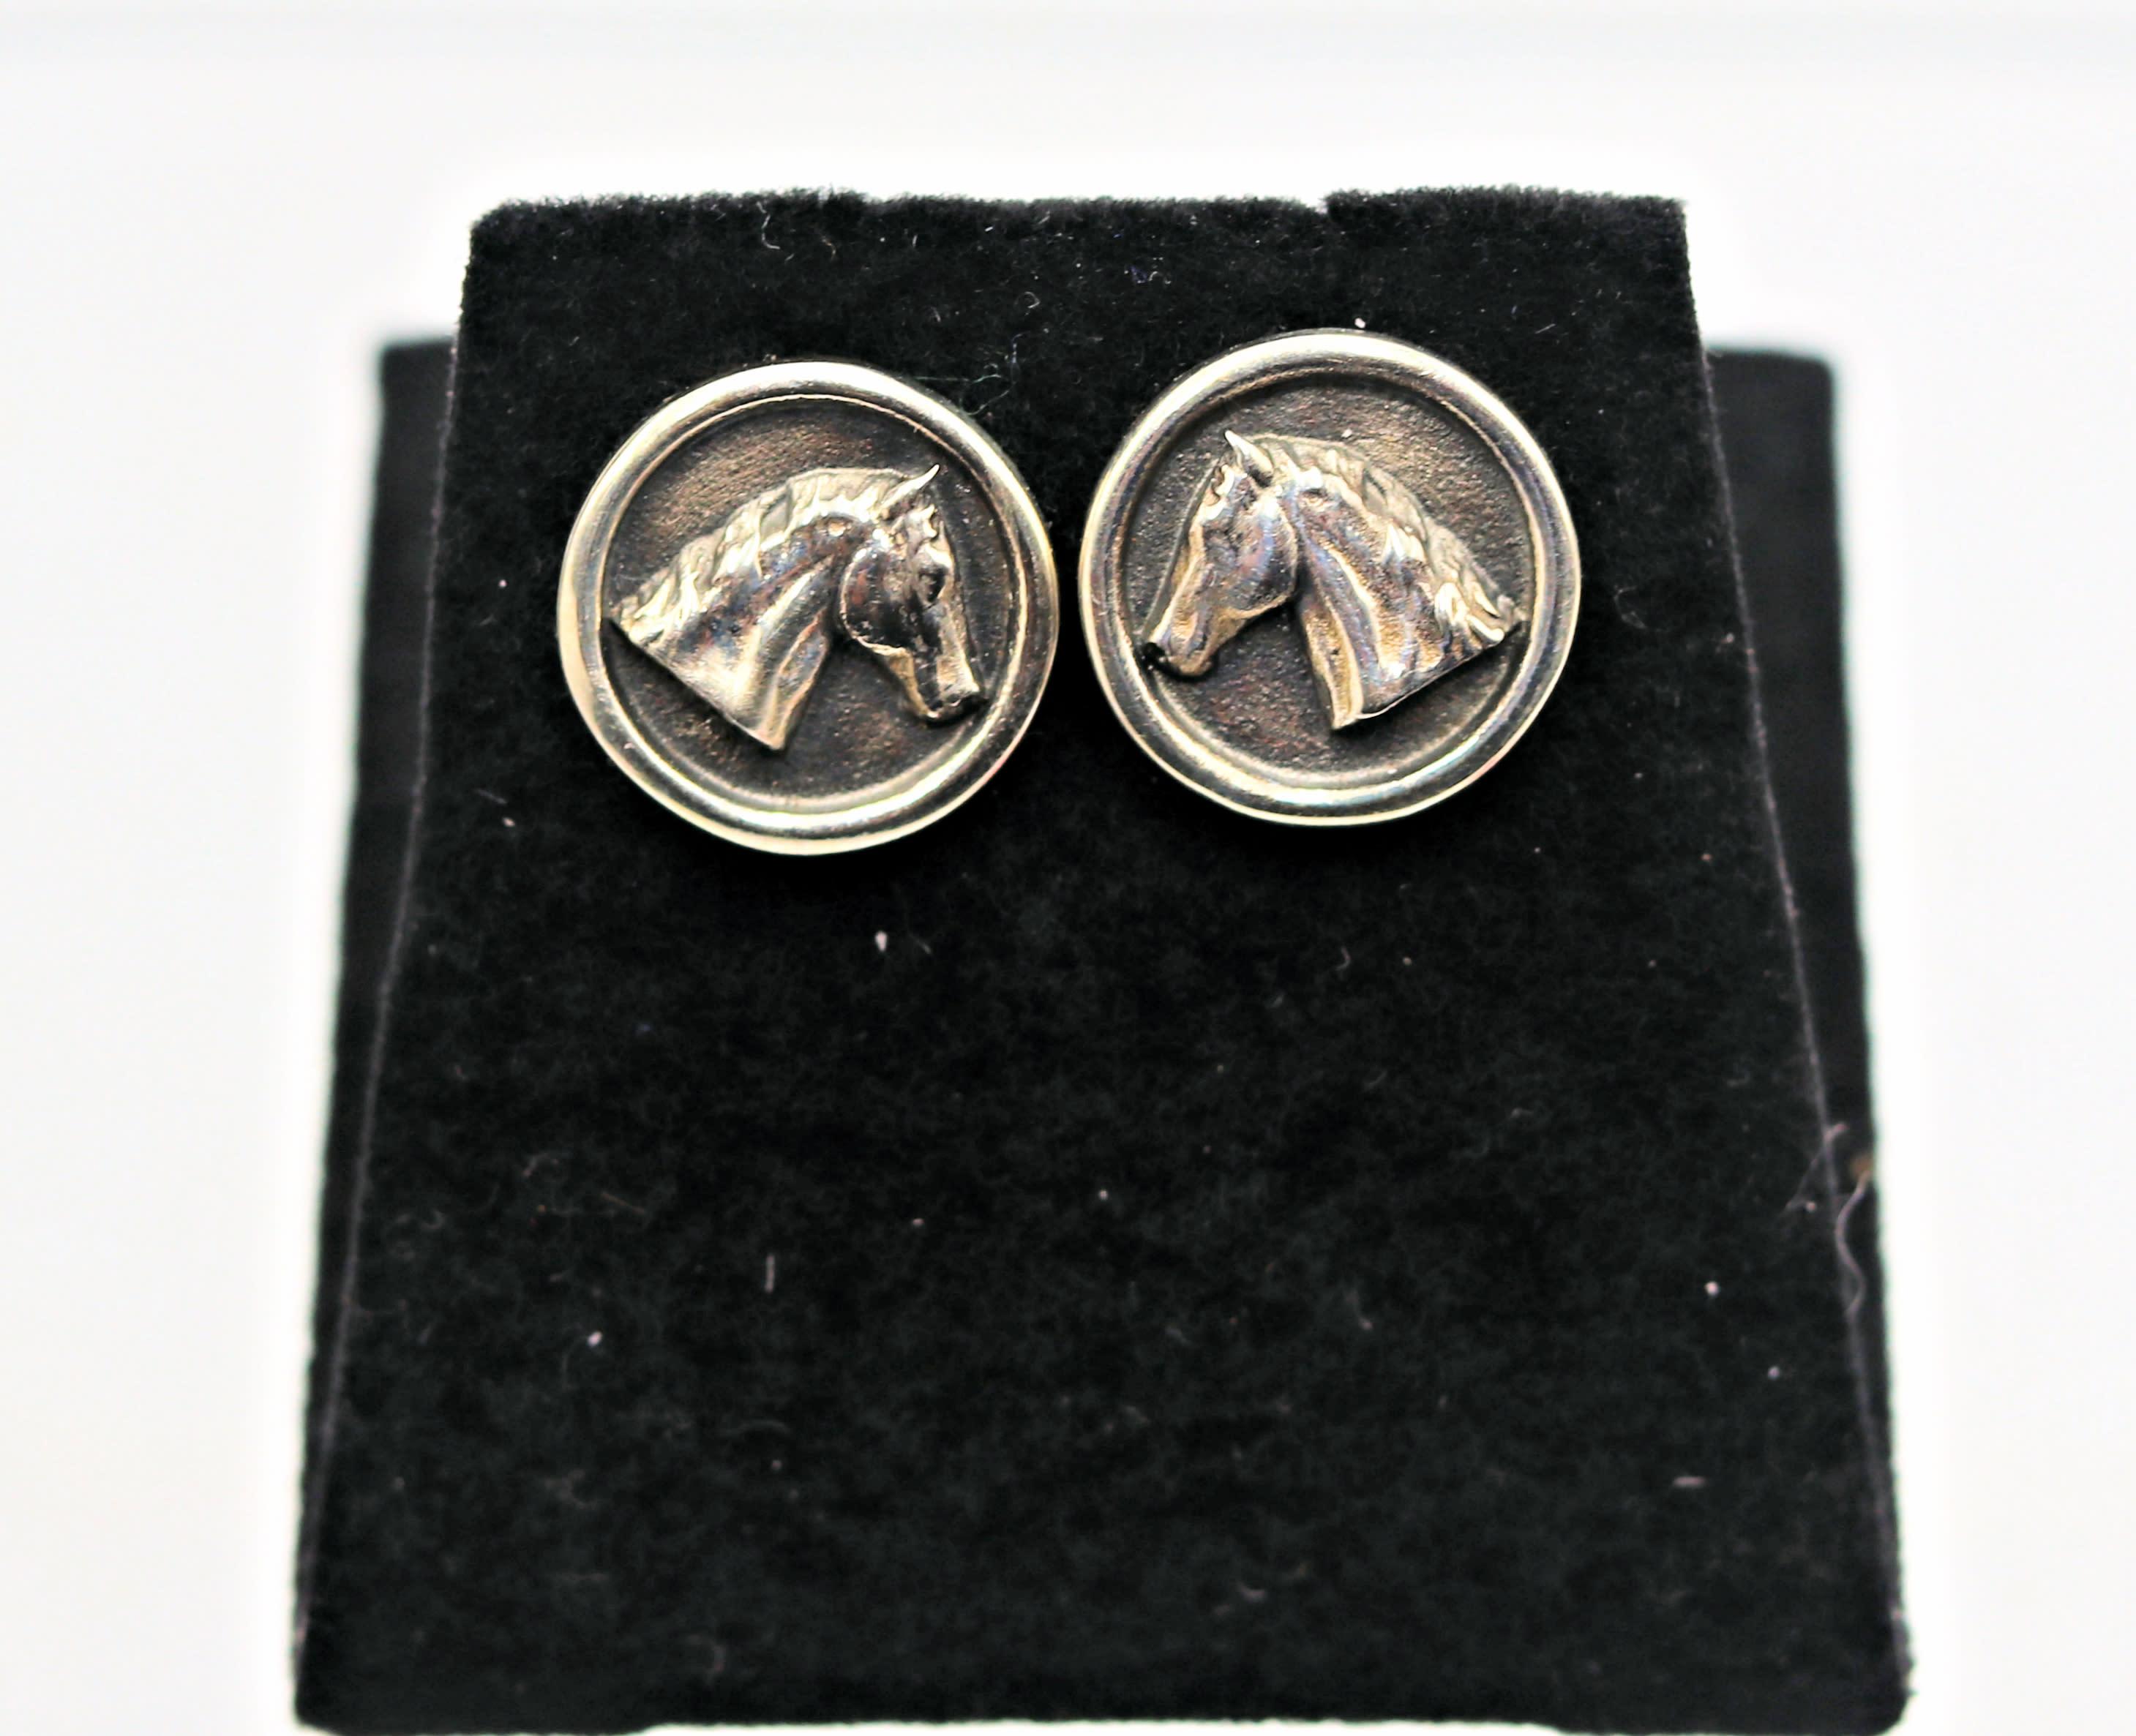 Stephen johnson sterling silver horsehead post earrings high polish finish 125 w5jr5y